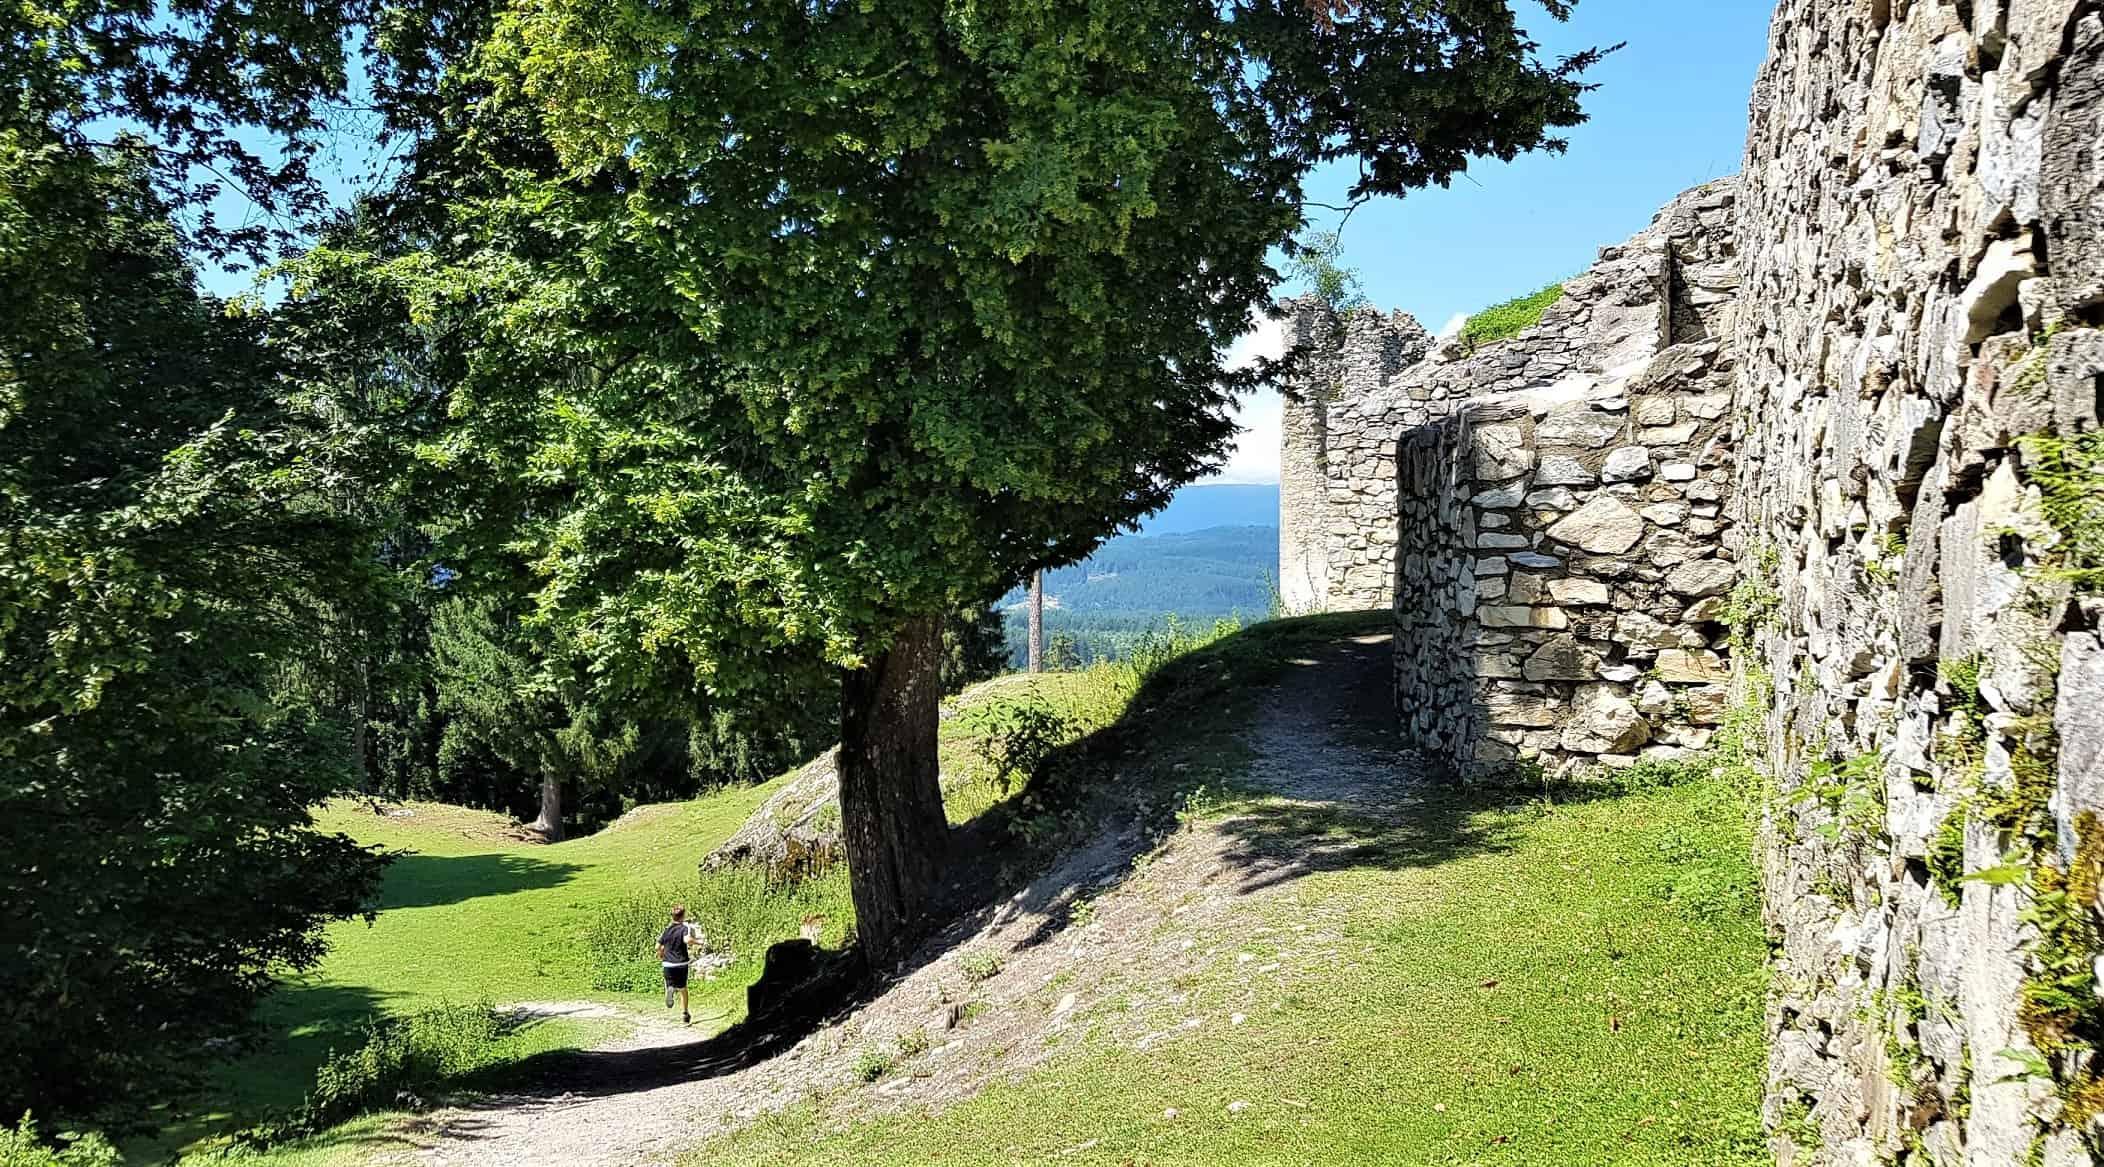 Mauern Ruine Rosegg Tierpark in Kärnten